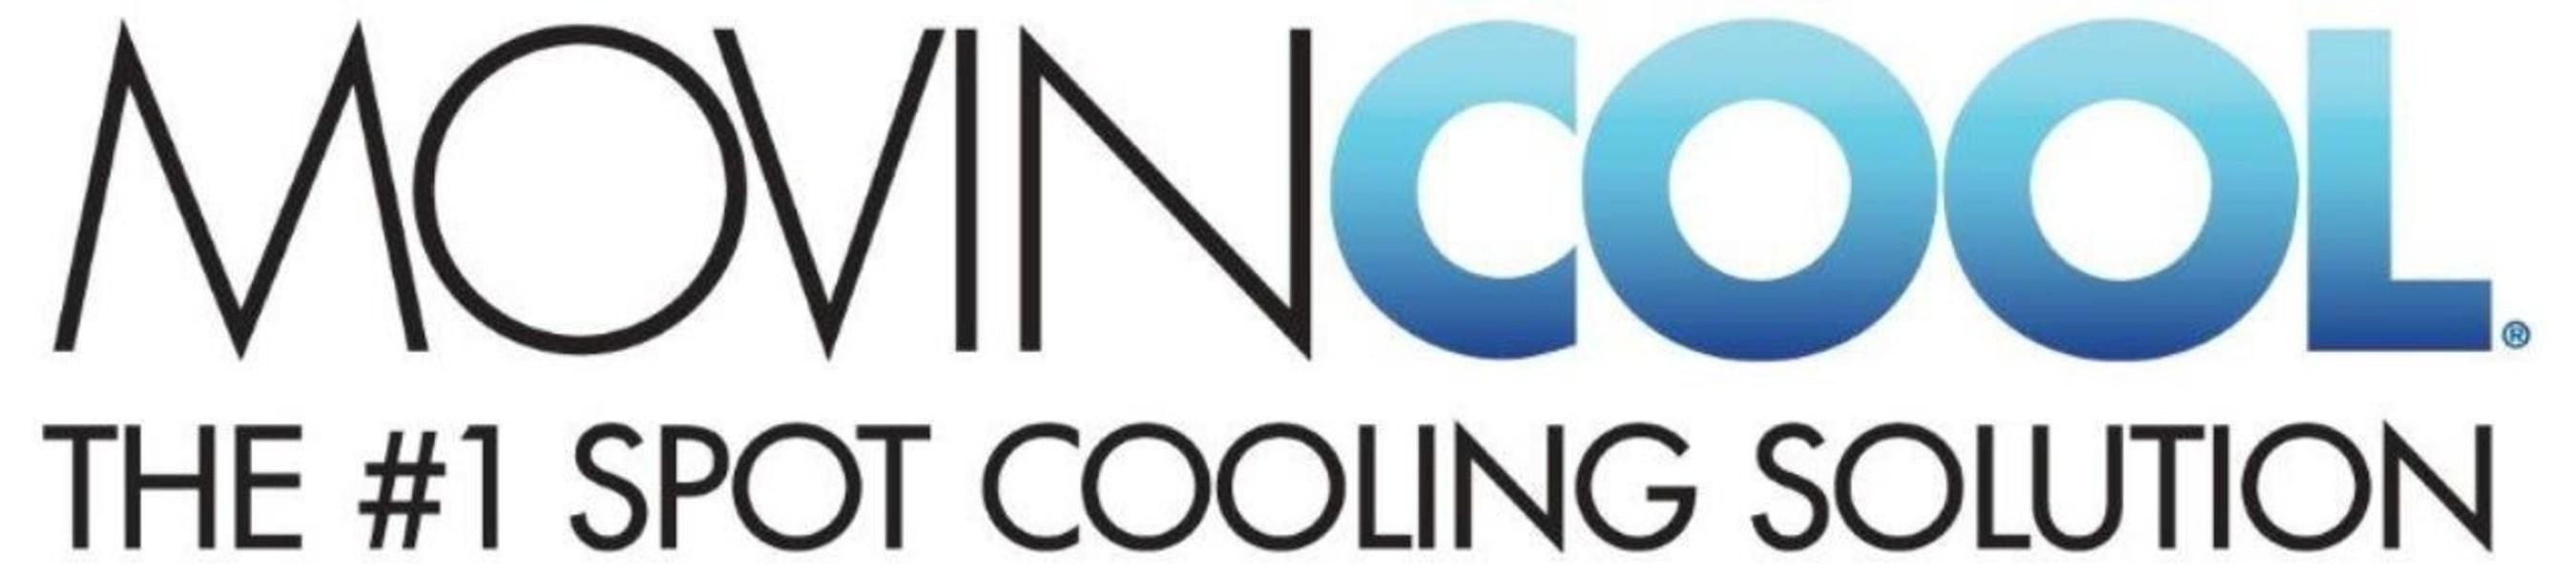 MovinCool Logo